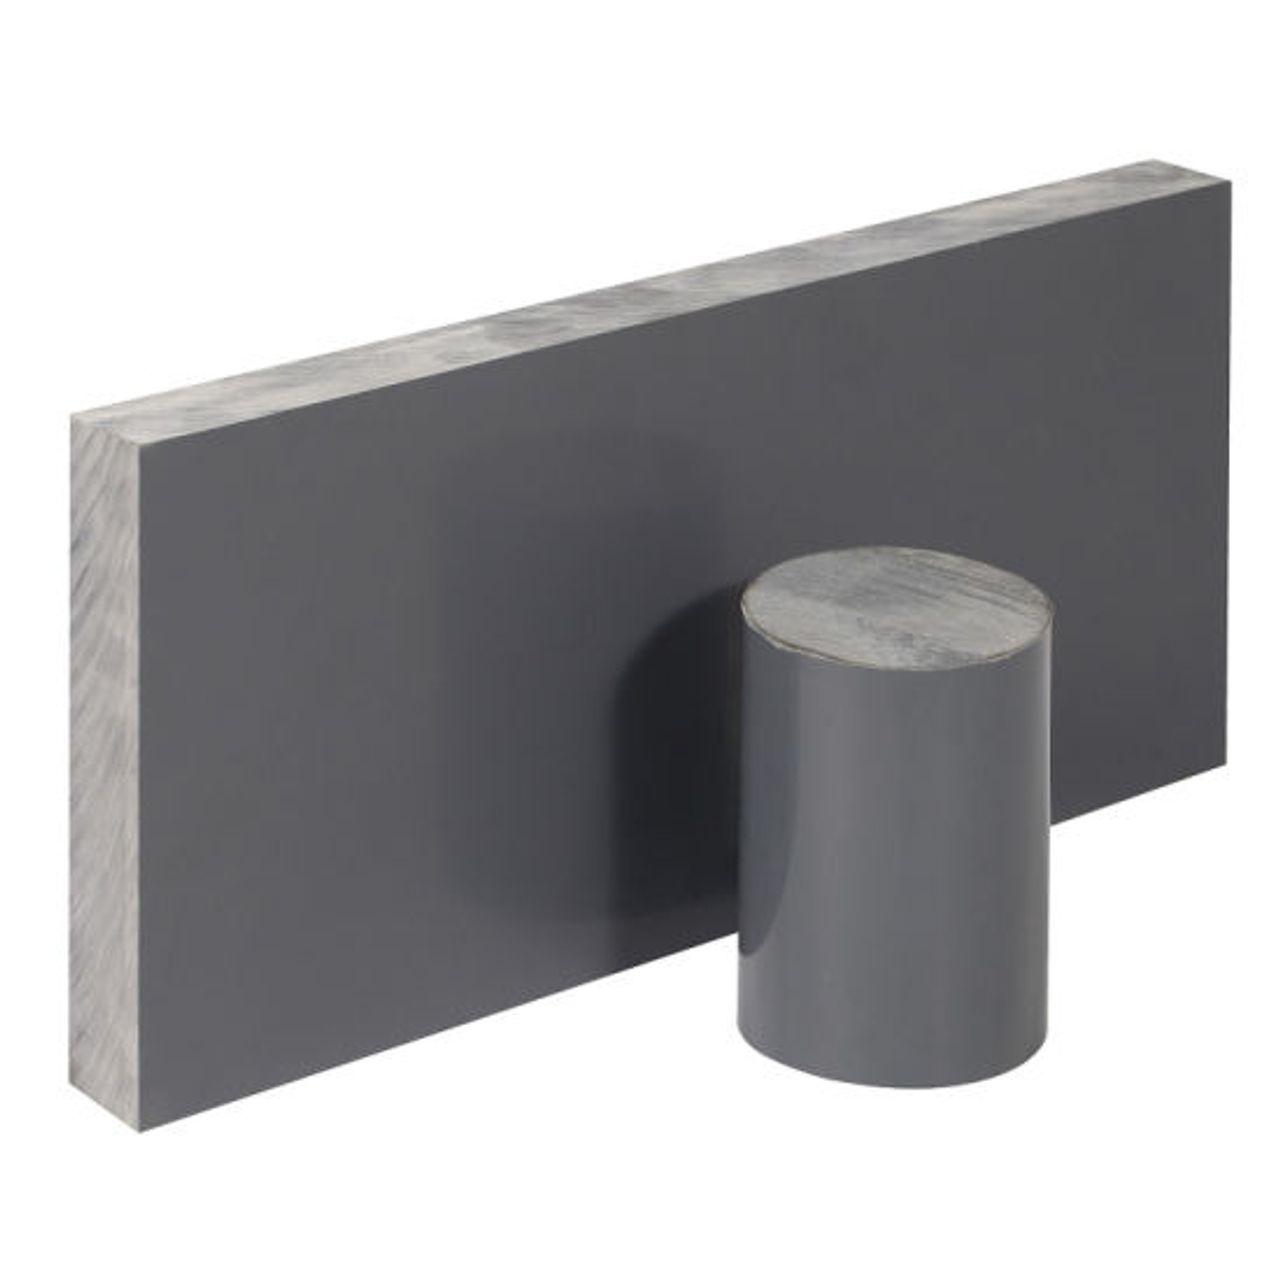 PVC (Polyvinylchloride) kunststof platen en staf materialen